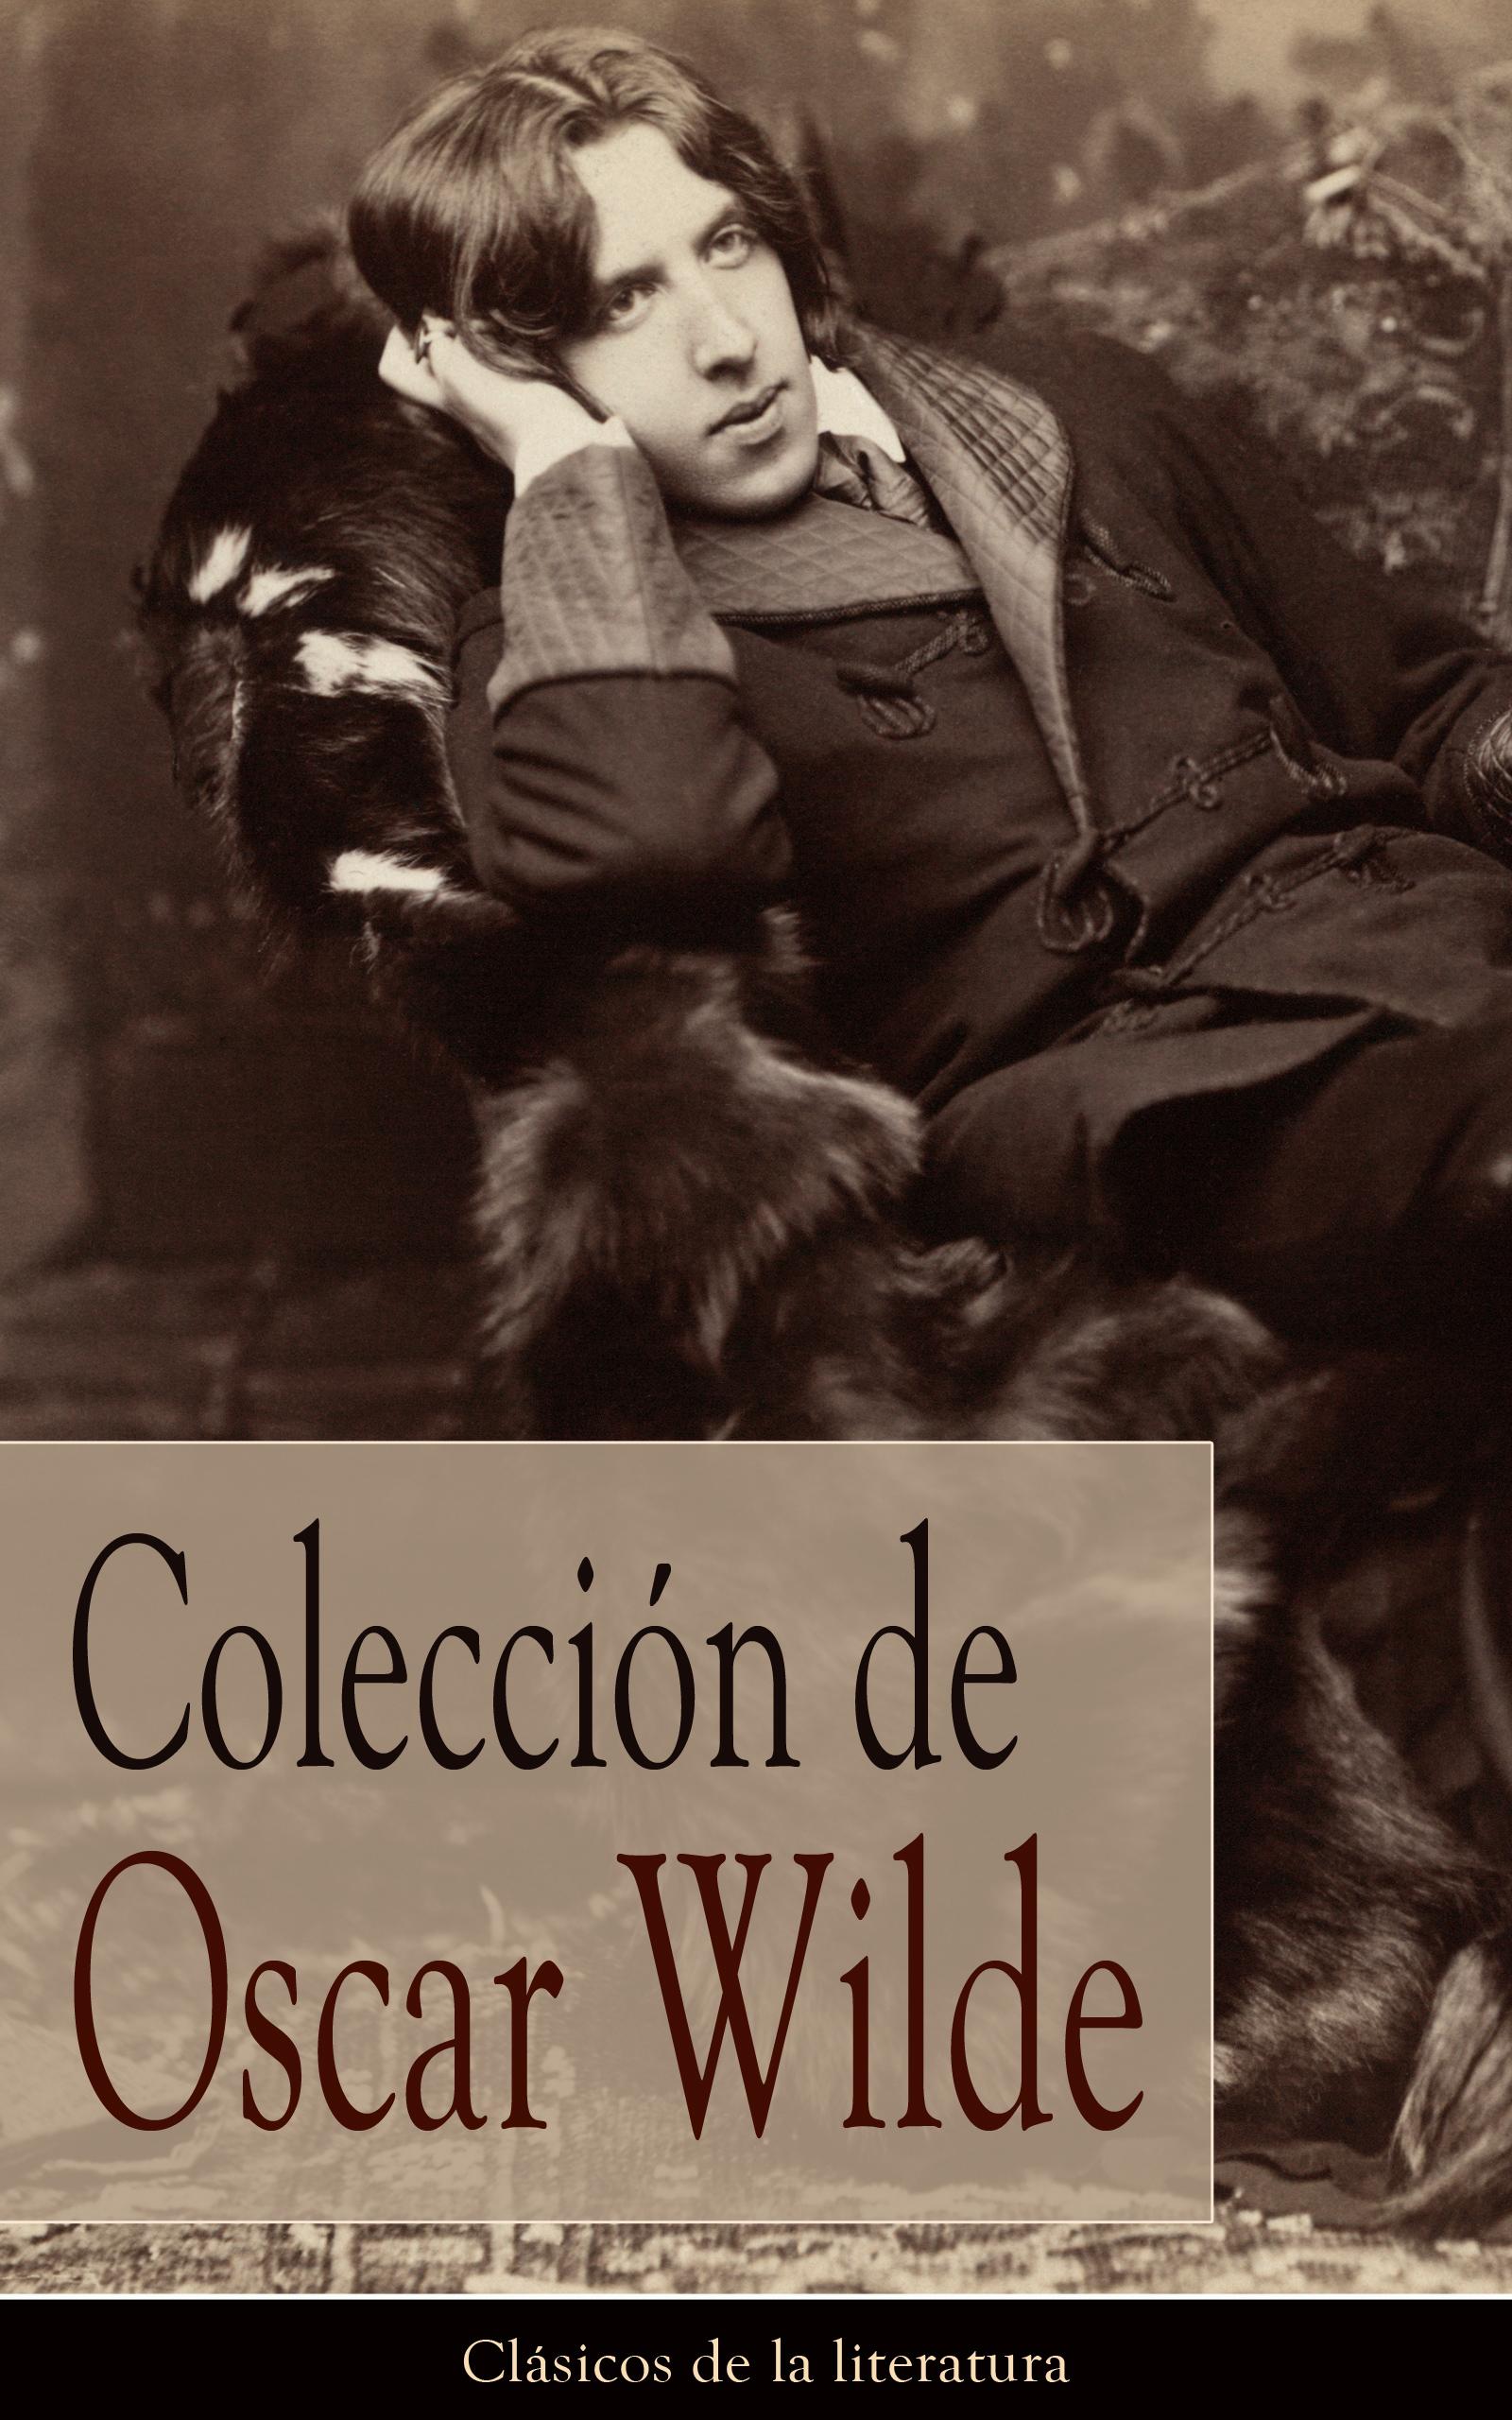 Oscar Wilde Colección de Oscar Wilde oscar wilde complete works of oscar wilde